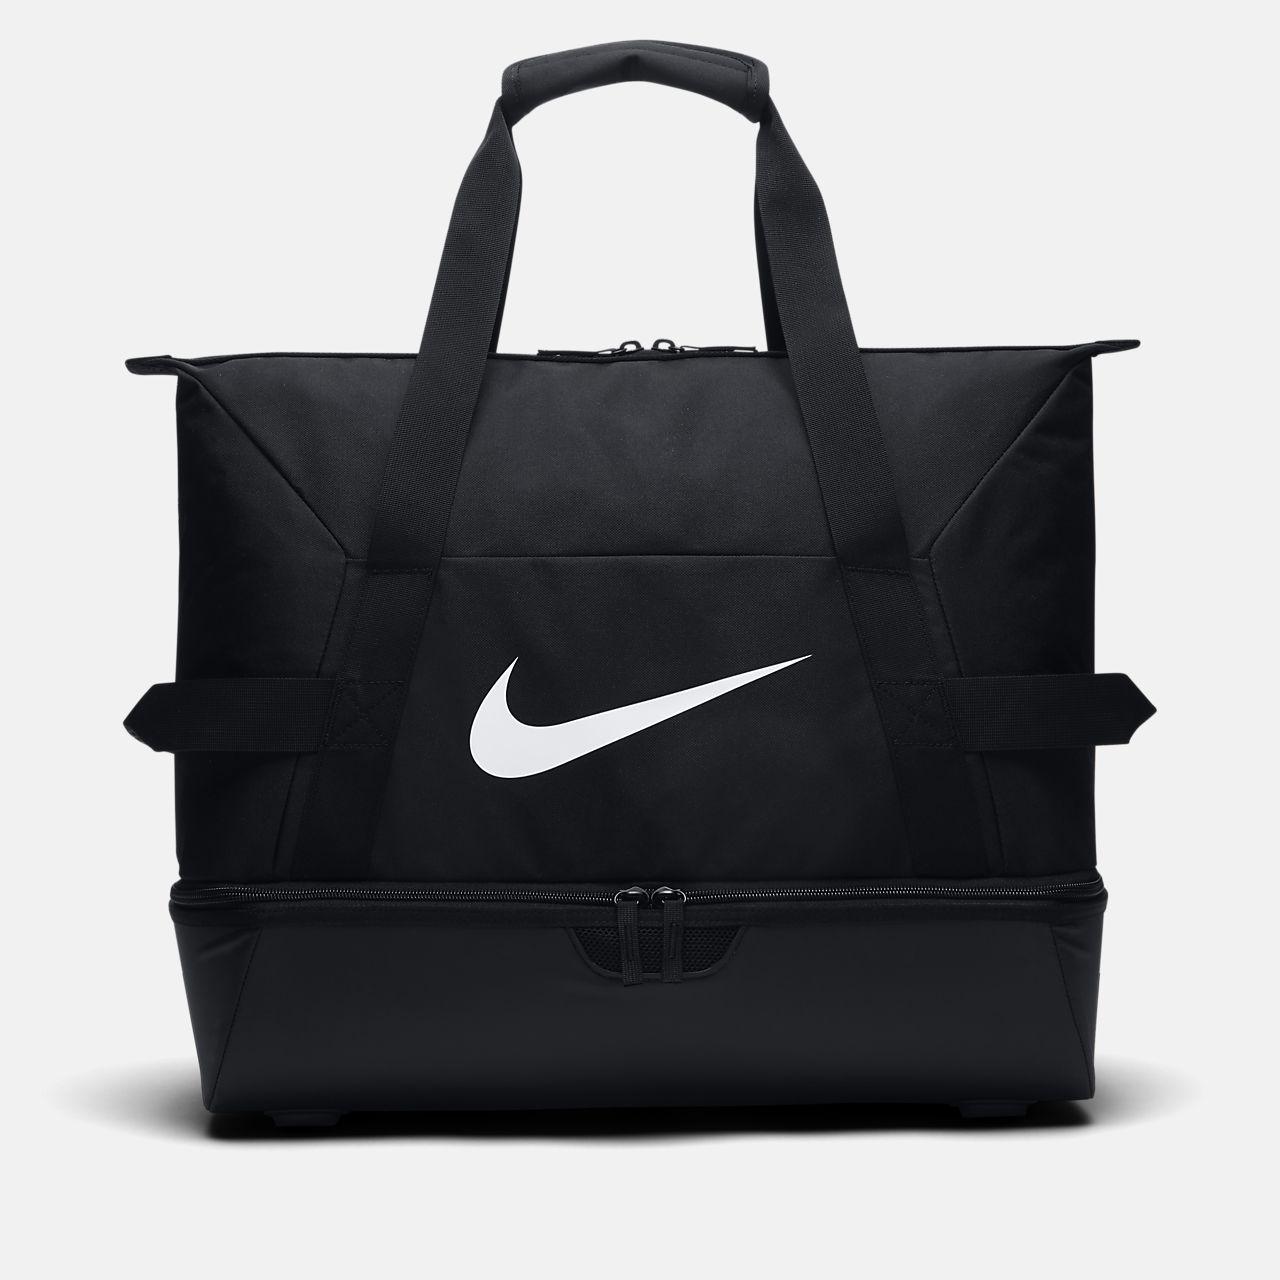 Sac de sport pour le football Nike Academy Team Hardcase (taille moyenne)